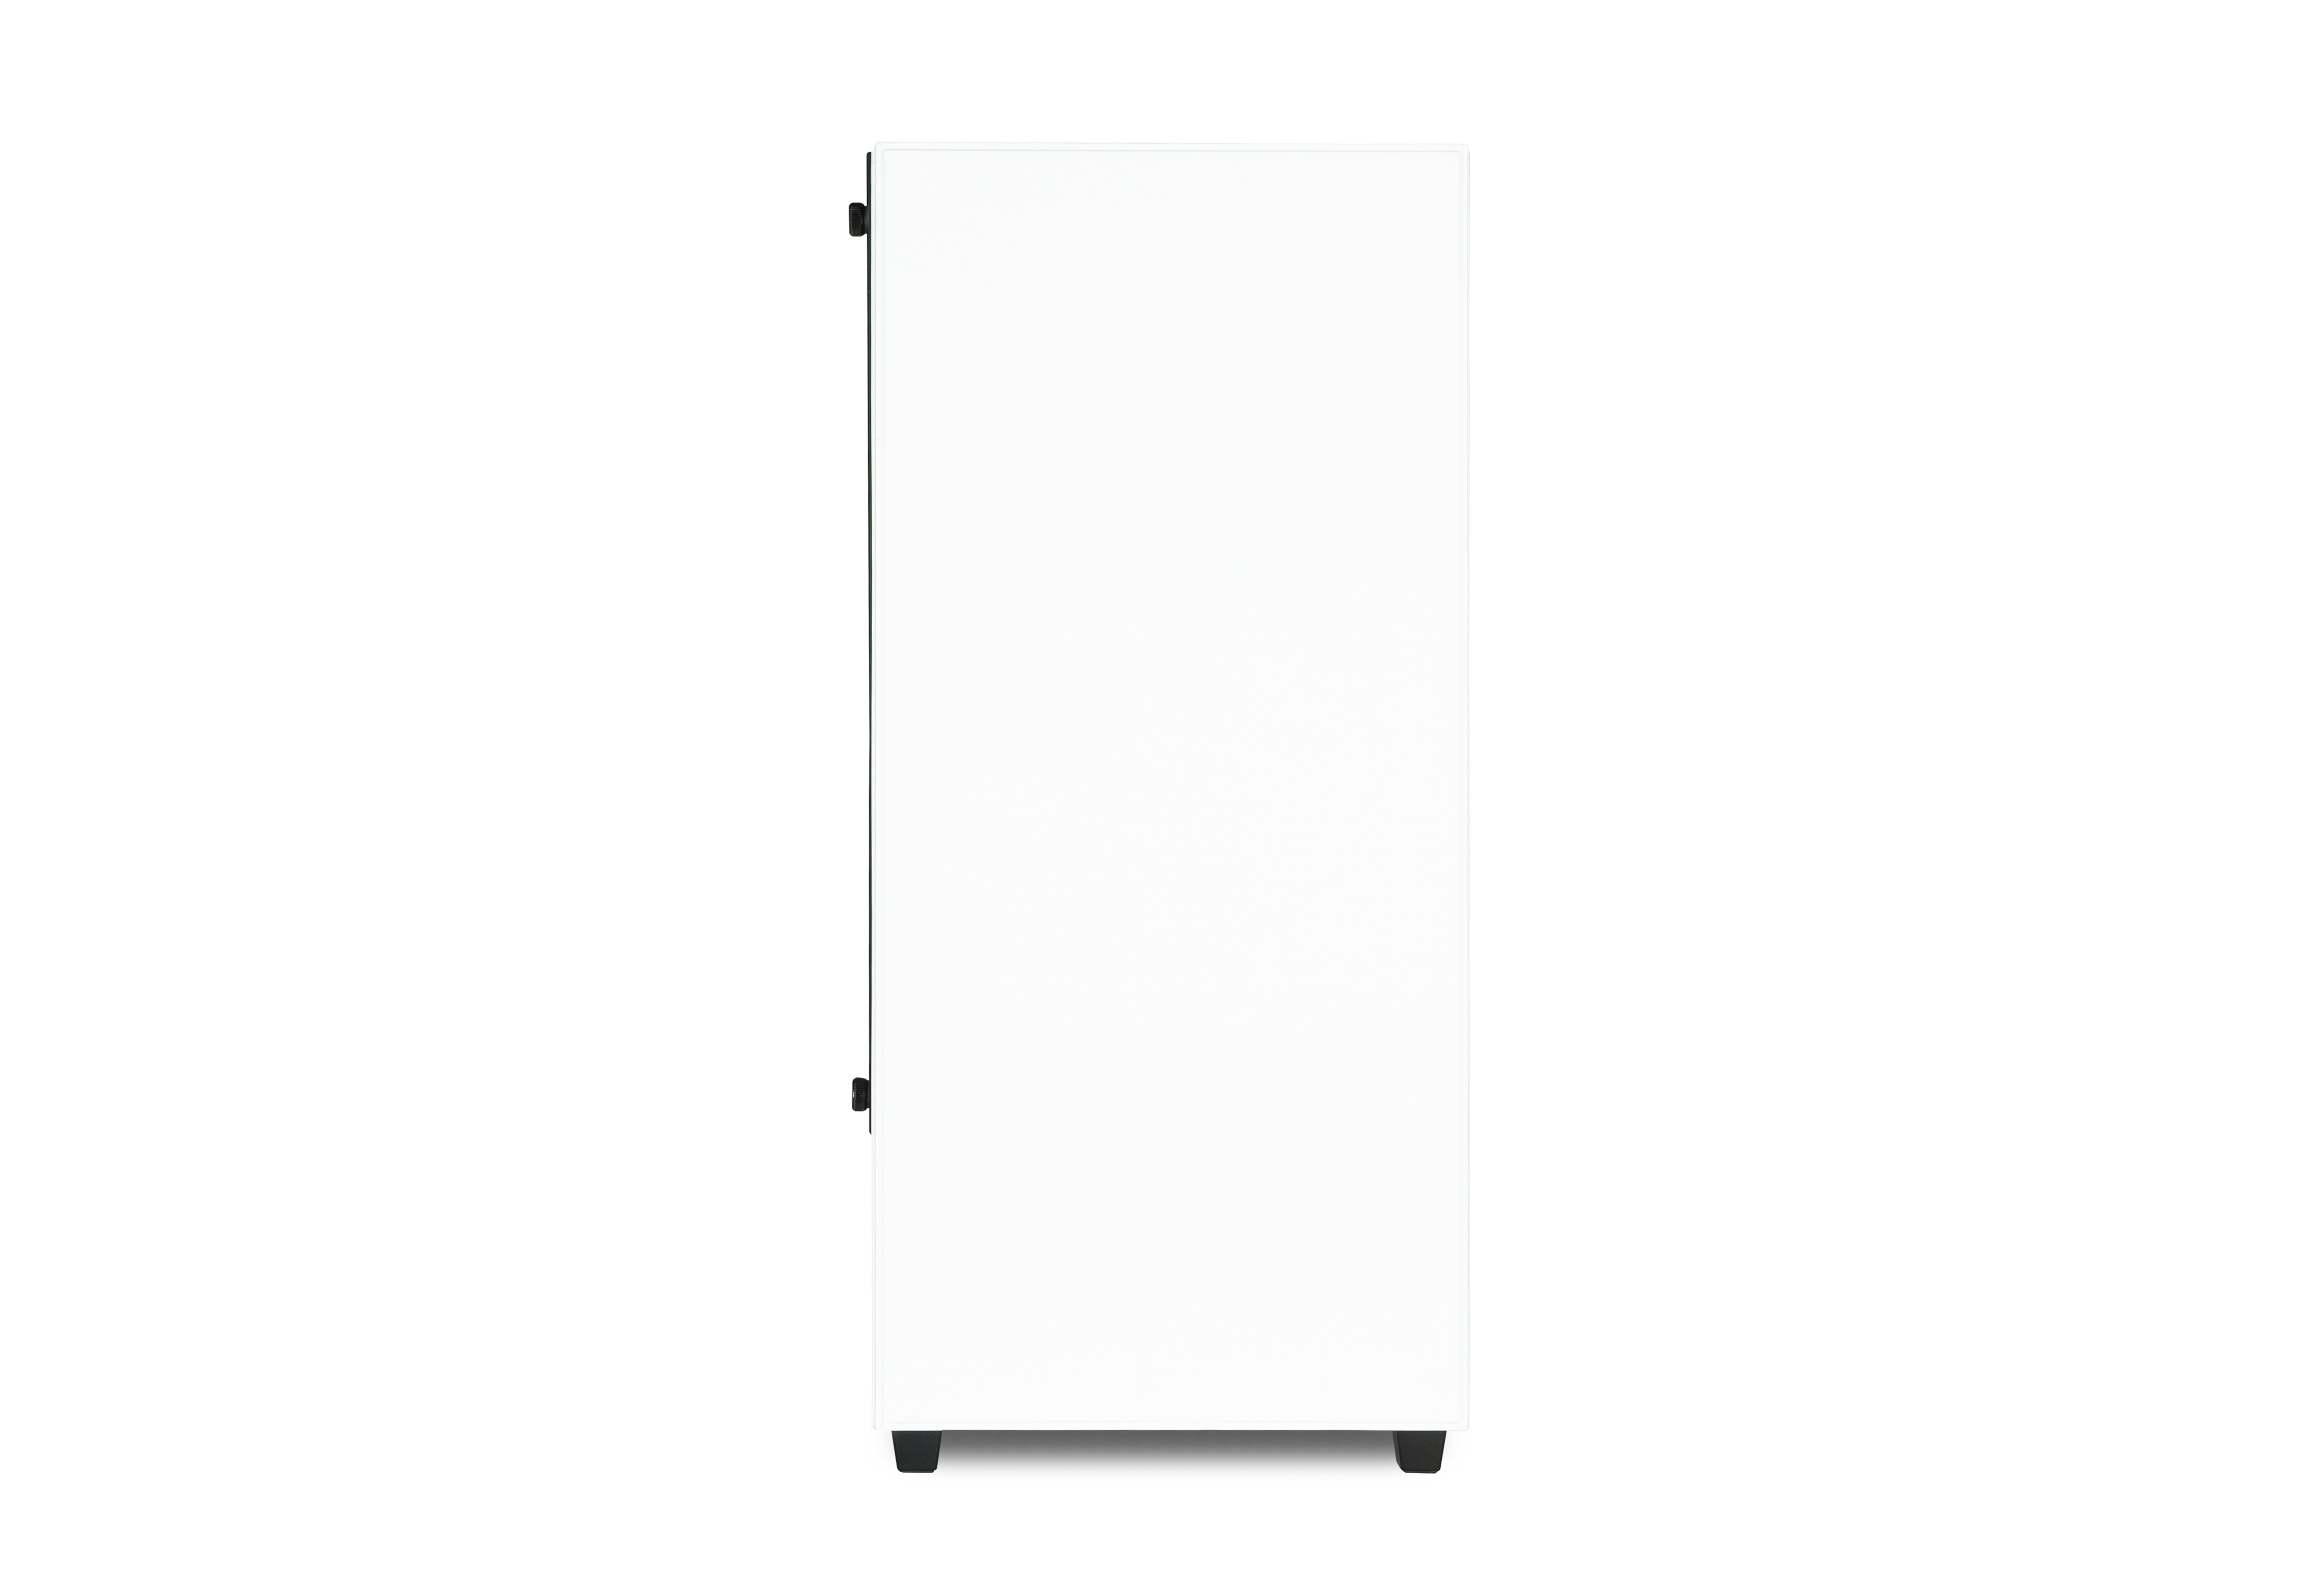 Nexus C White front